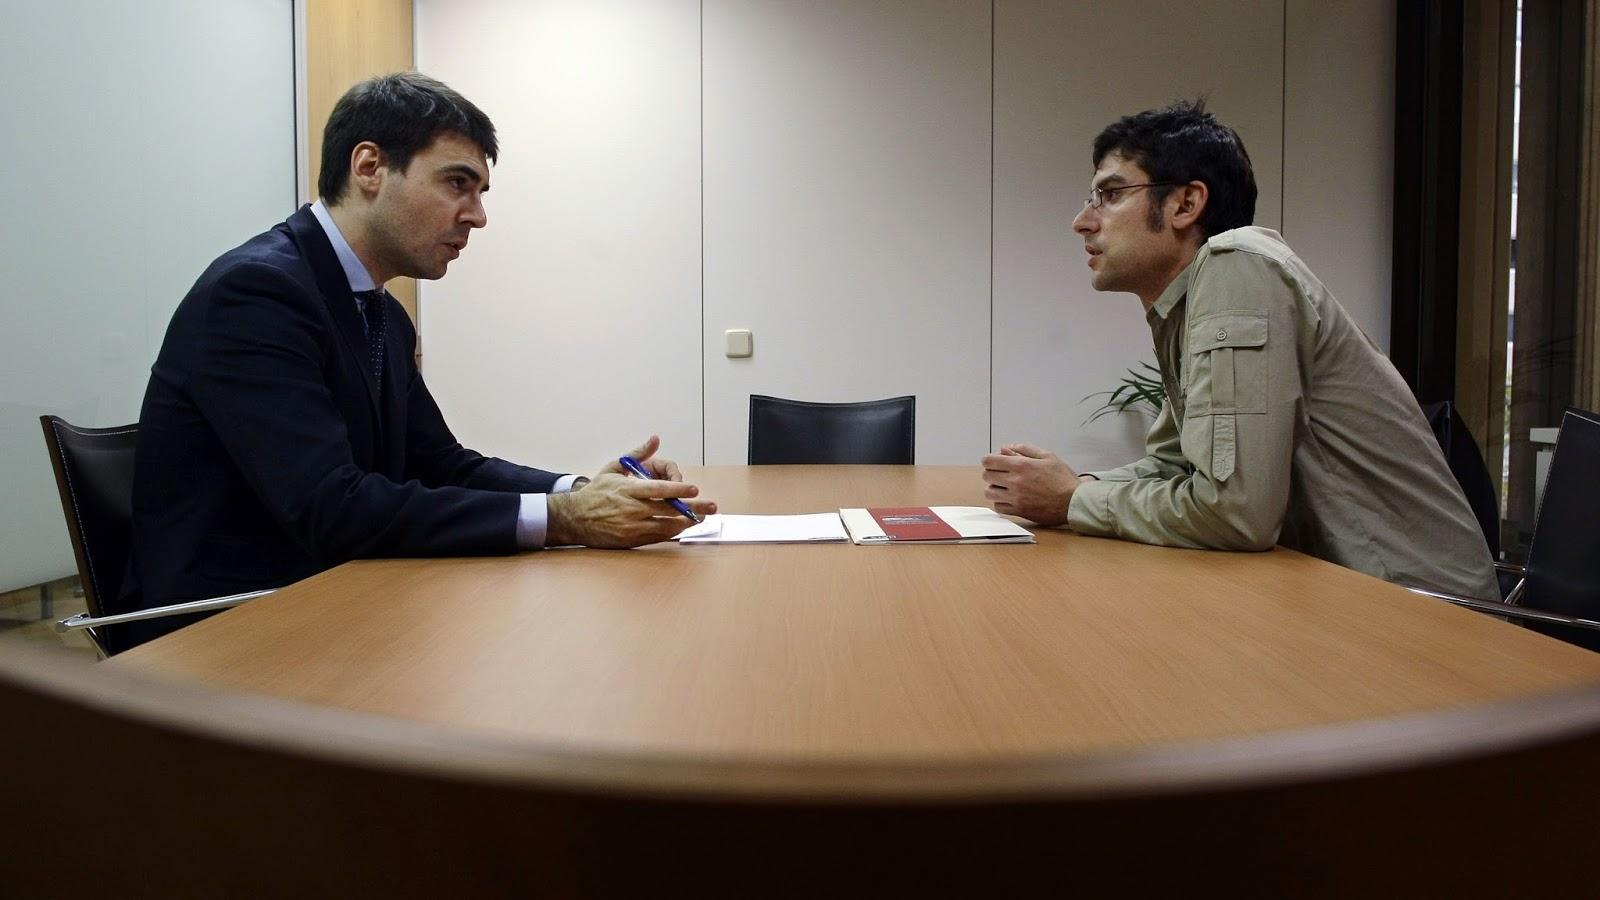 the conversation between interviewer and interviewee goodfriends5 best interview process